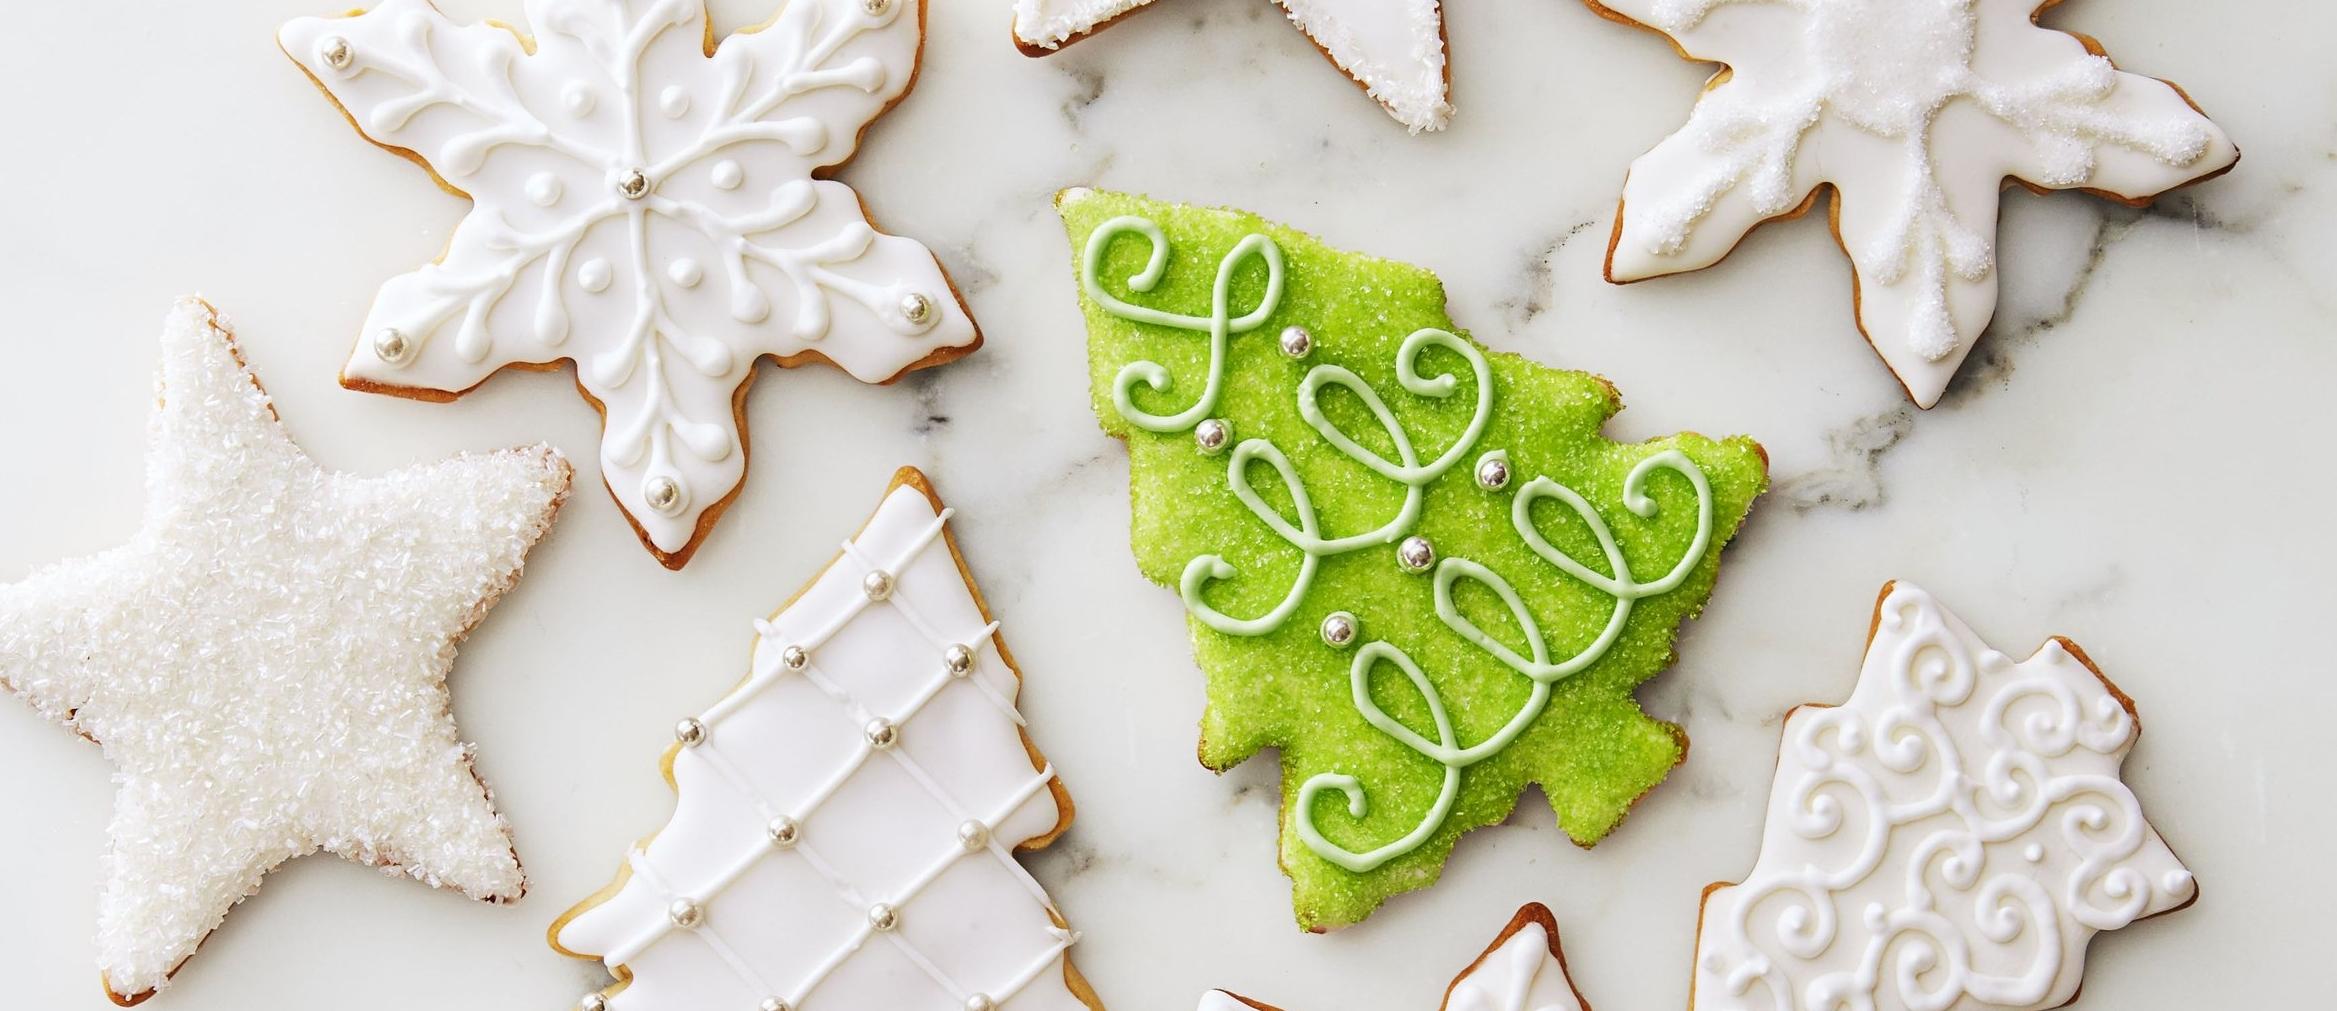 Cookie Walk - Saturday, November 24th, 9:00 am - 1:00 pm